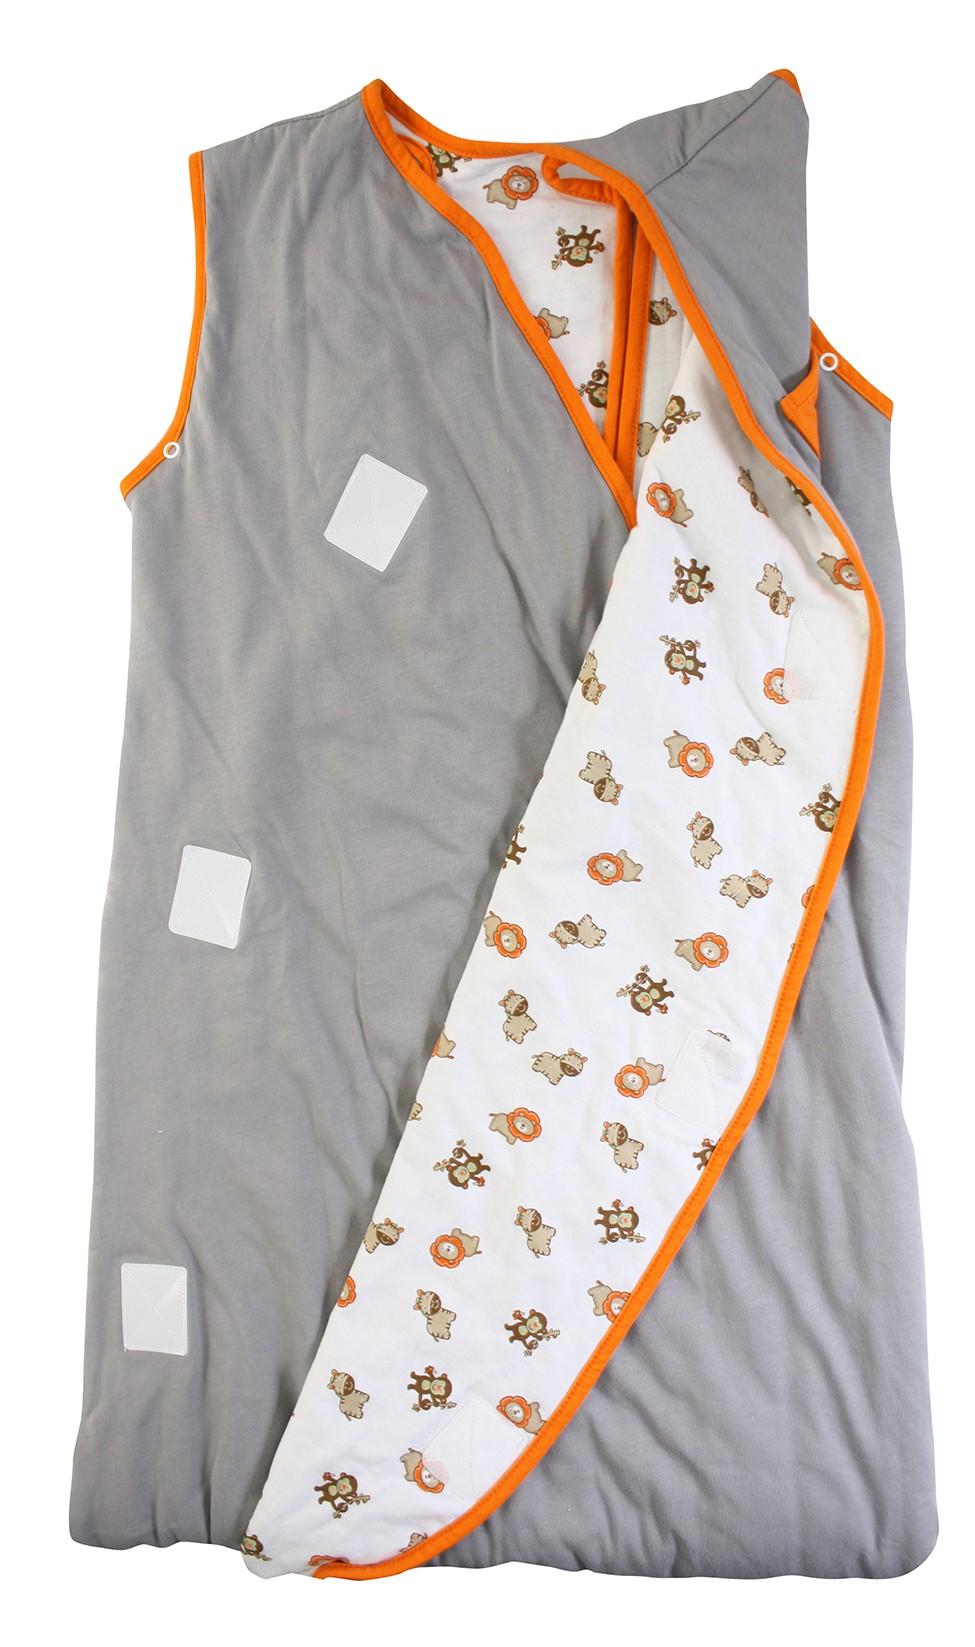 Sac de dormit multifunctional Grey Orange Zoo Animal Travel 0-6 luni 2.5 Tog